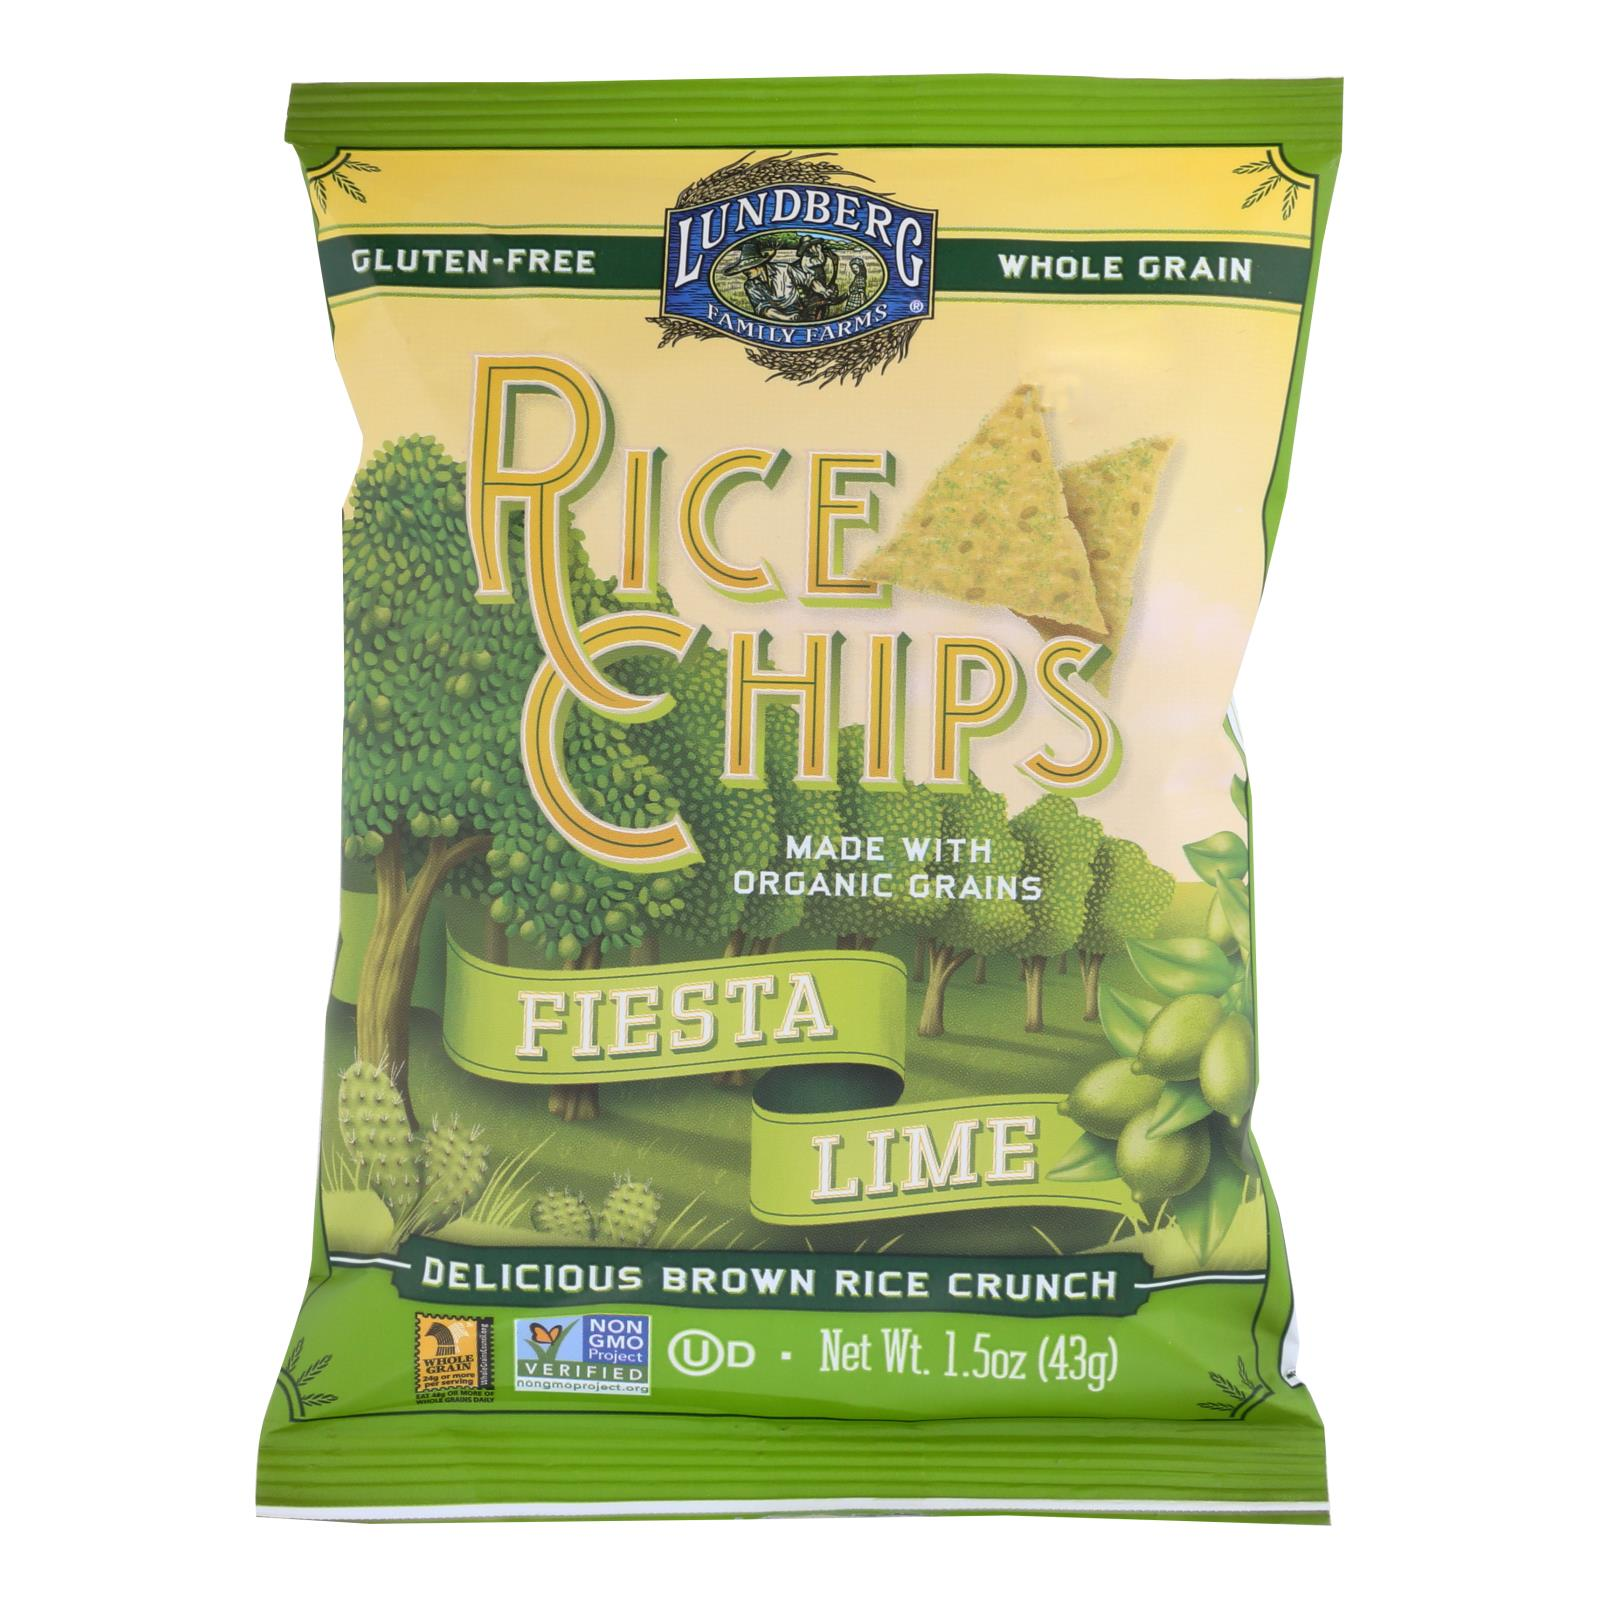 Lundberg Family Farms - Rice Chips - Fiesta Lme - Case of 24-1.5 oz. %count(alt)